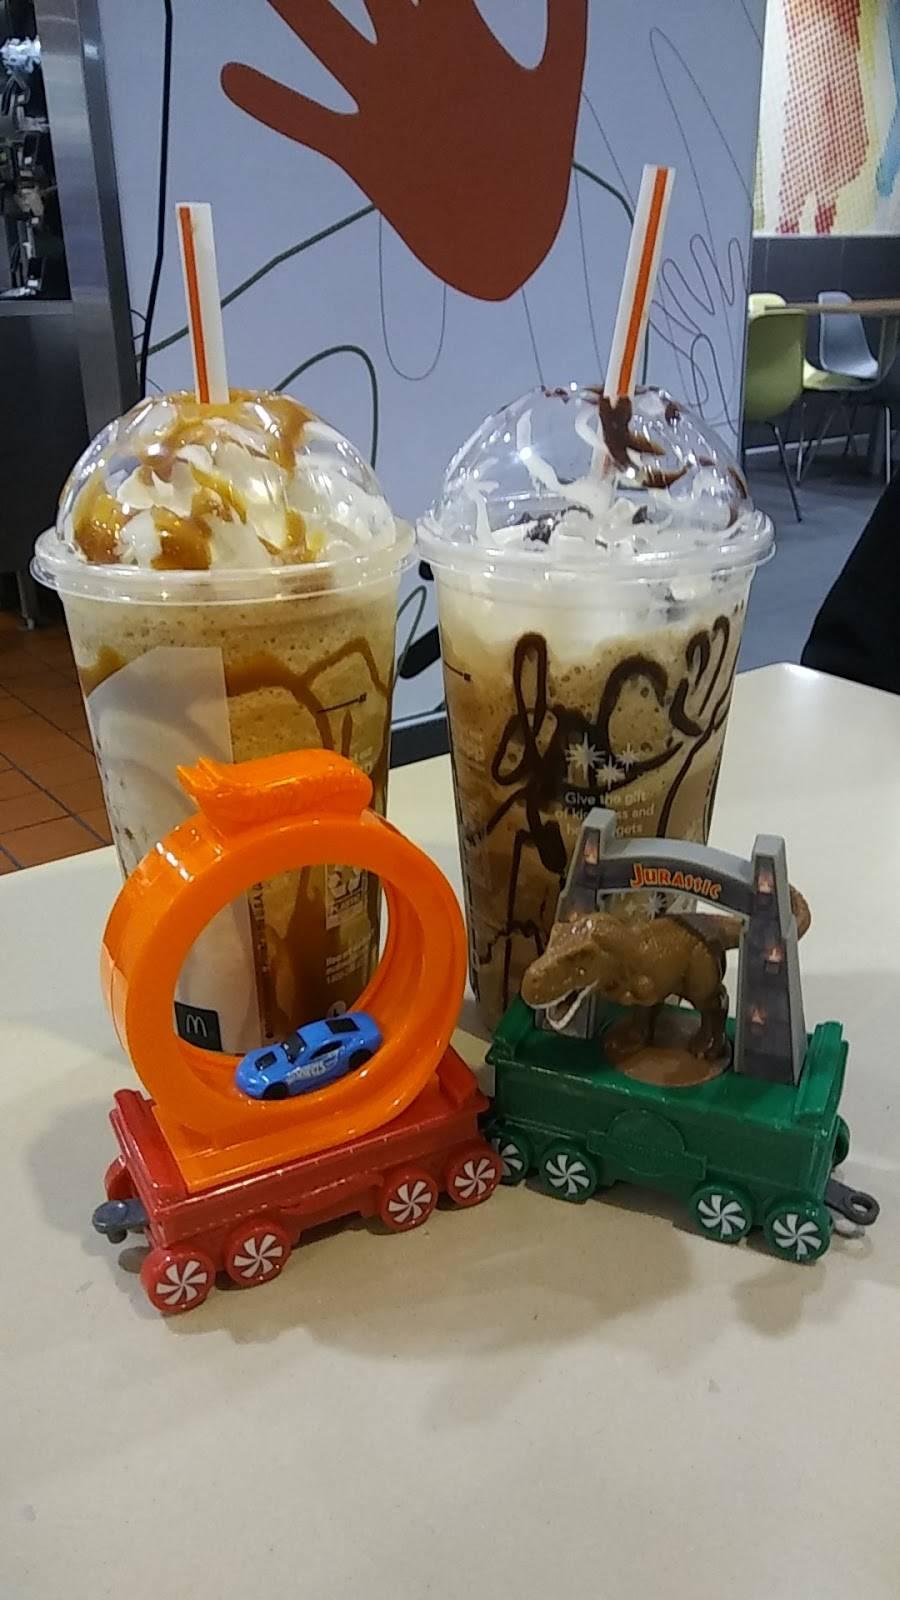 McDonalds   cafe   7487 N Ida Ave, Portland, OR 97203, USA   5032893544 OR +1 503-289-3544